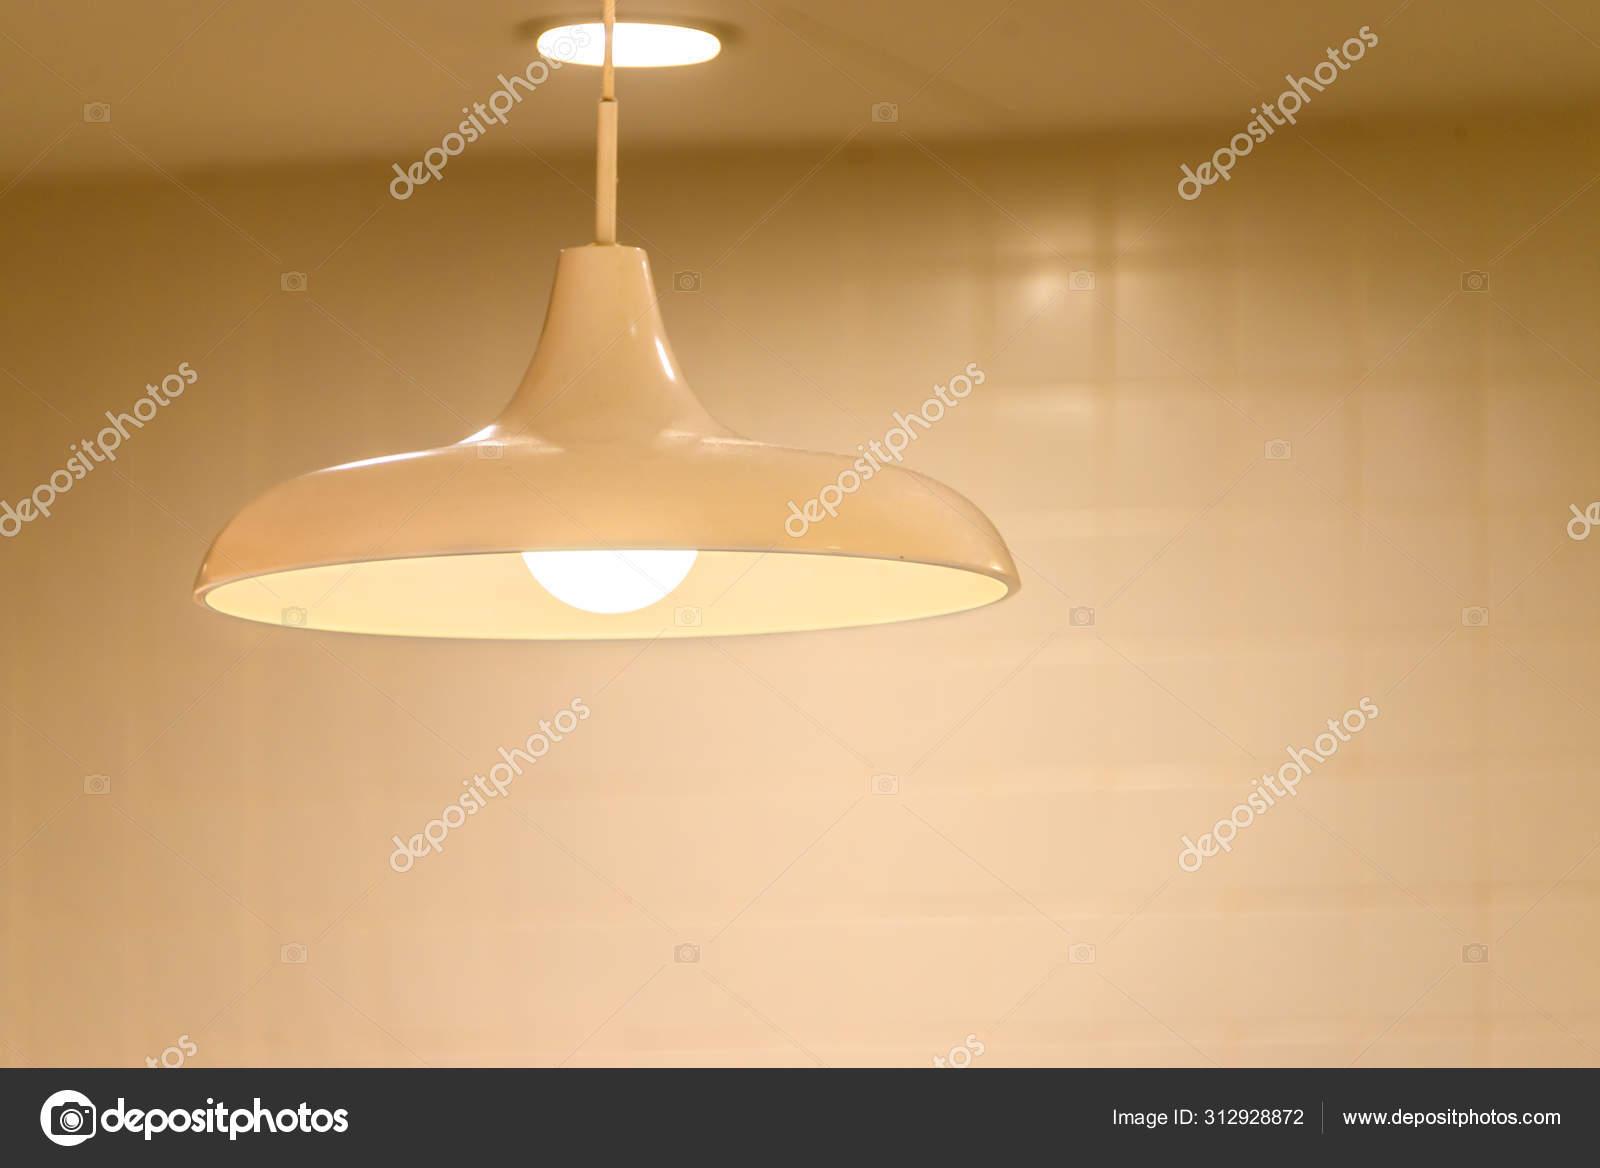 Modern Ceiling Lamp Interior Lighting Bulbs Decoration Contemporary Stock Photo C Pomphotothailand Gmail Com 312928872